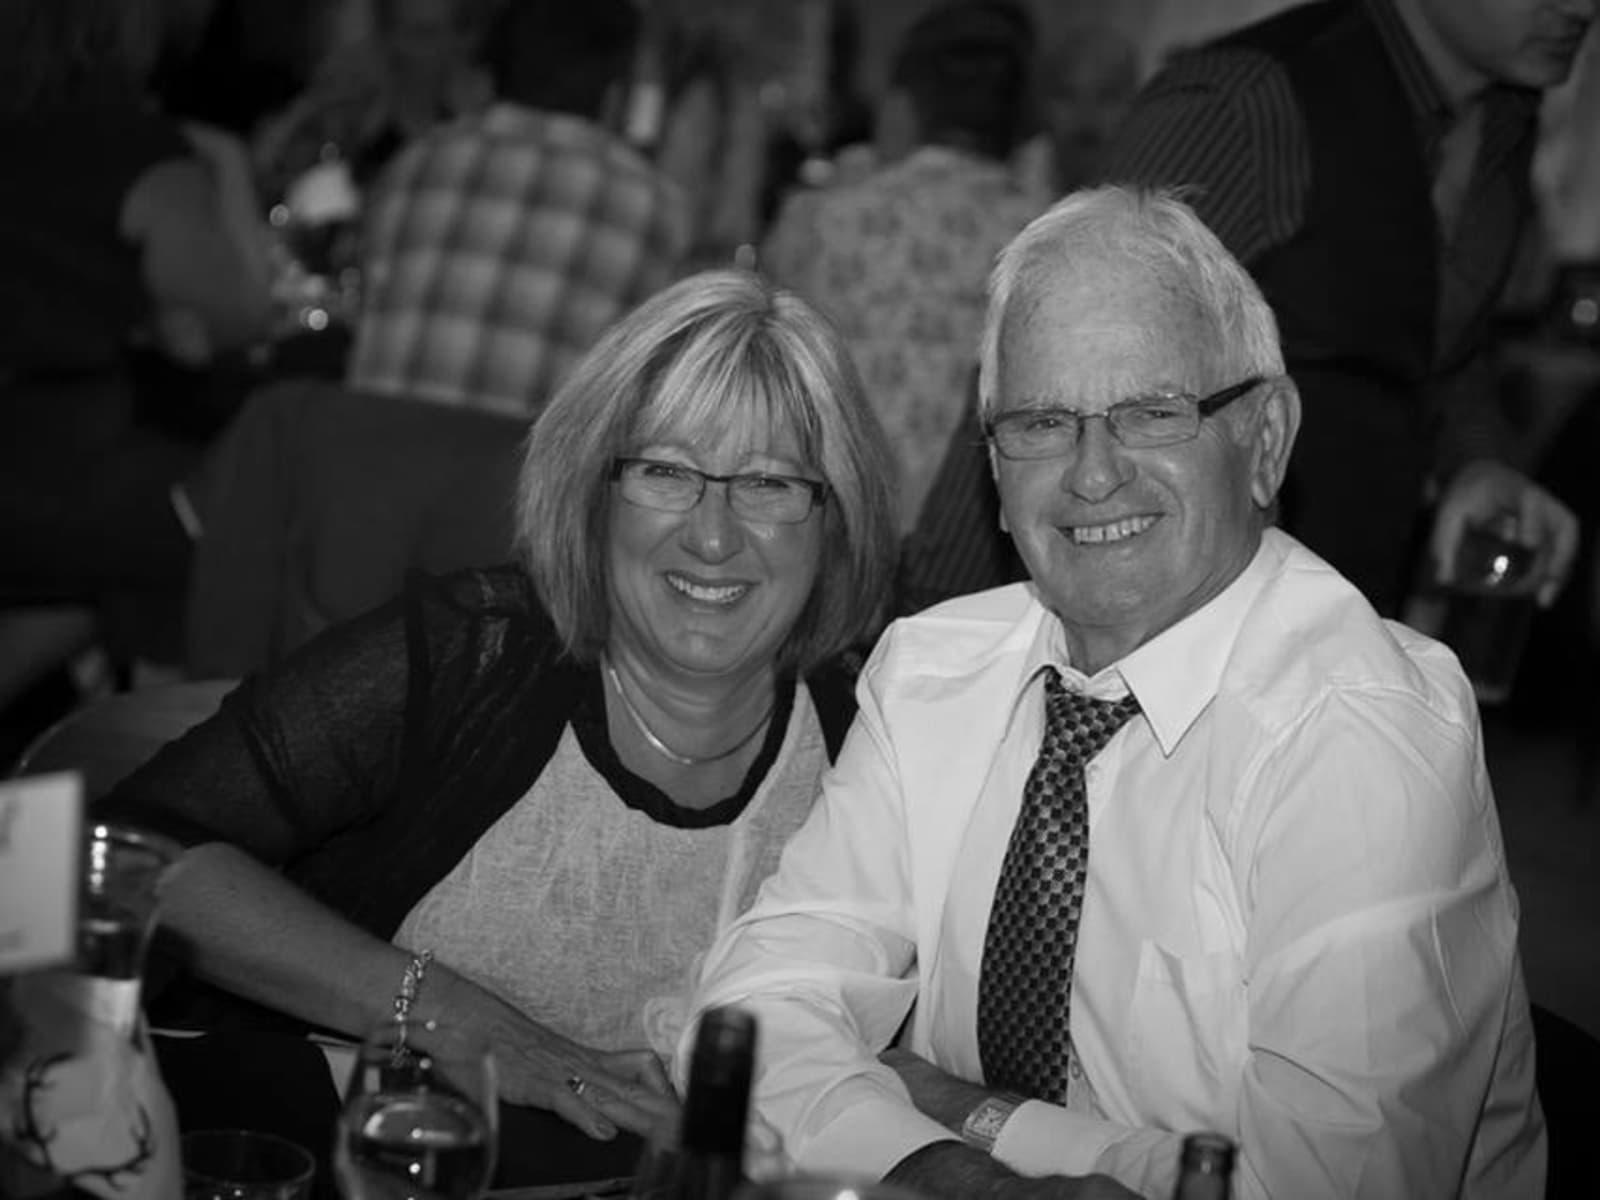 Barry & fiona & Barry from Mangawhai Heads, New Zealand